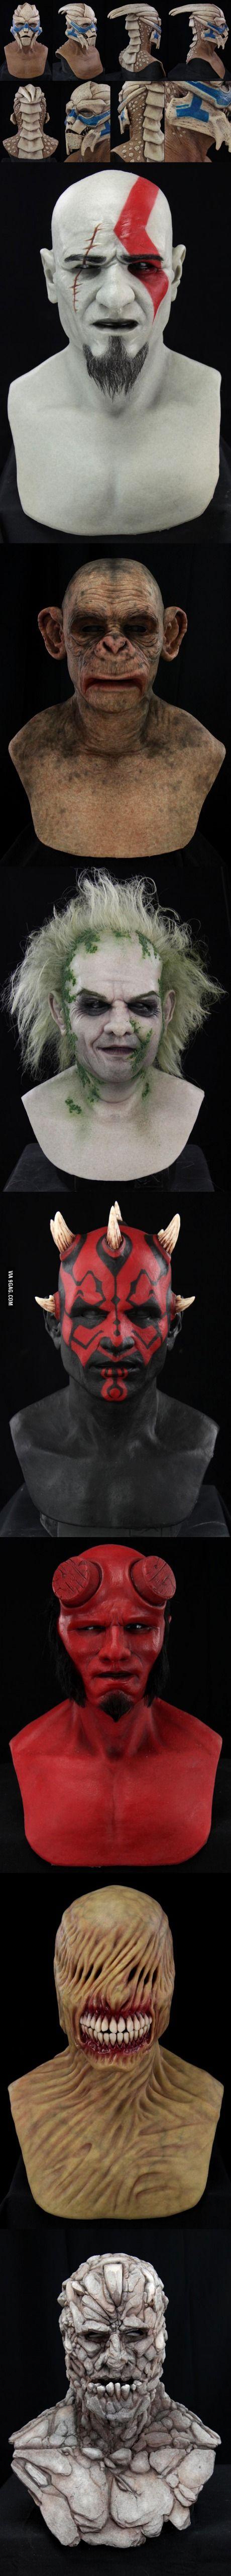 44 best Silicone masks images on Pinterest